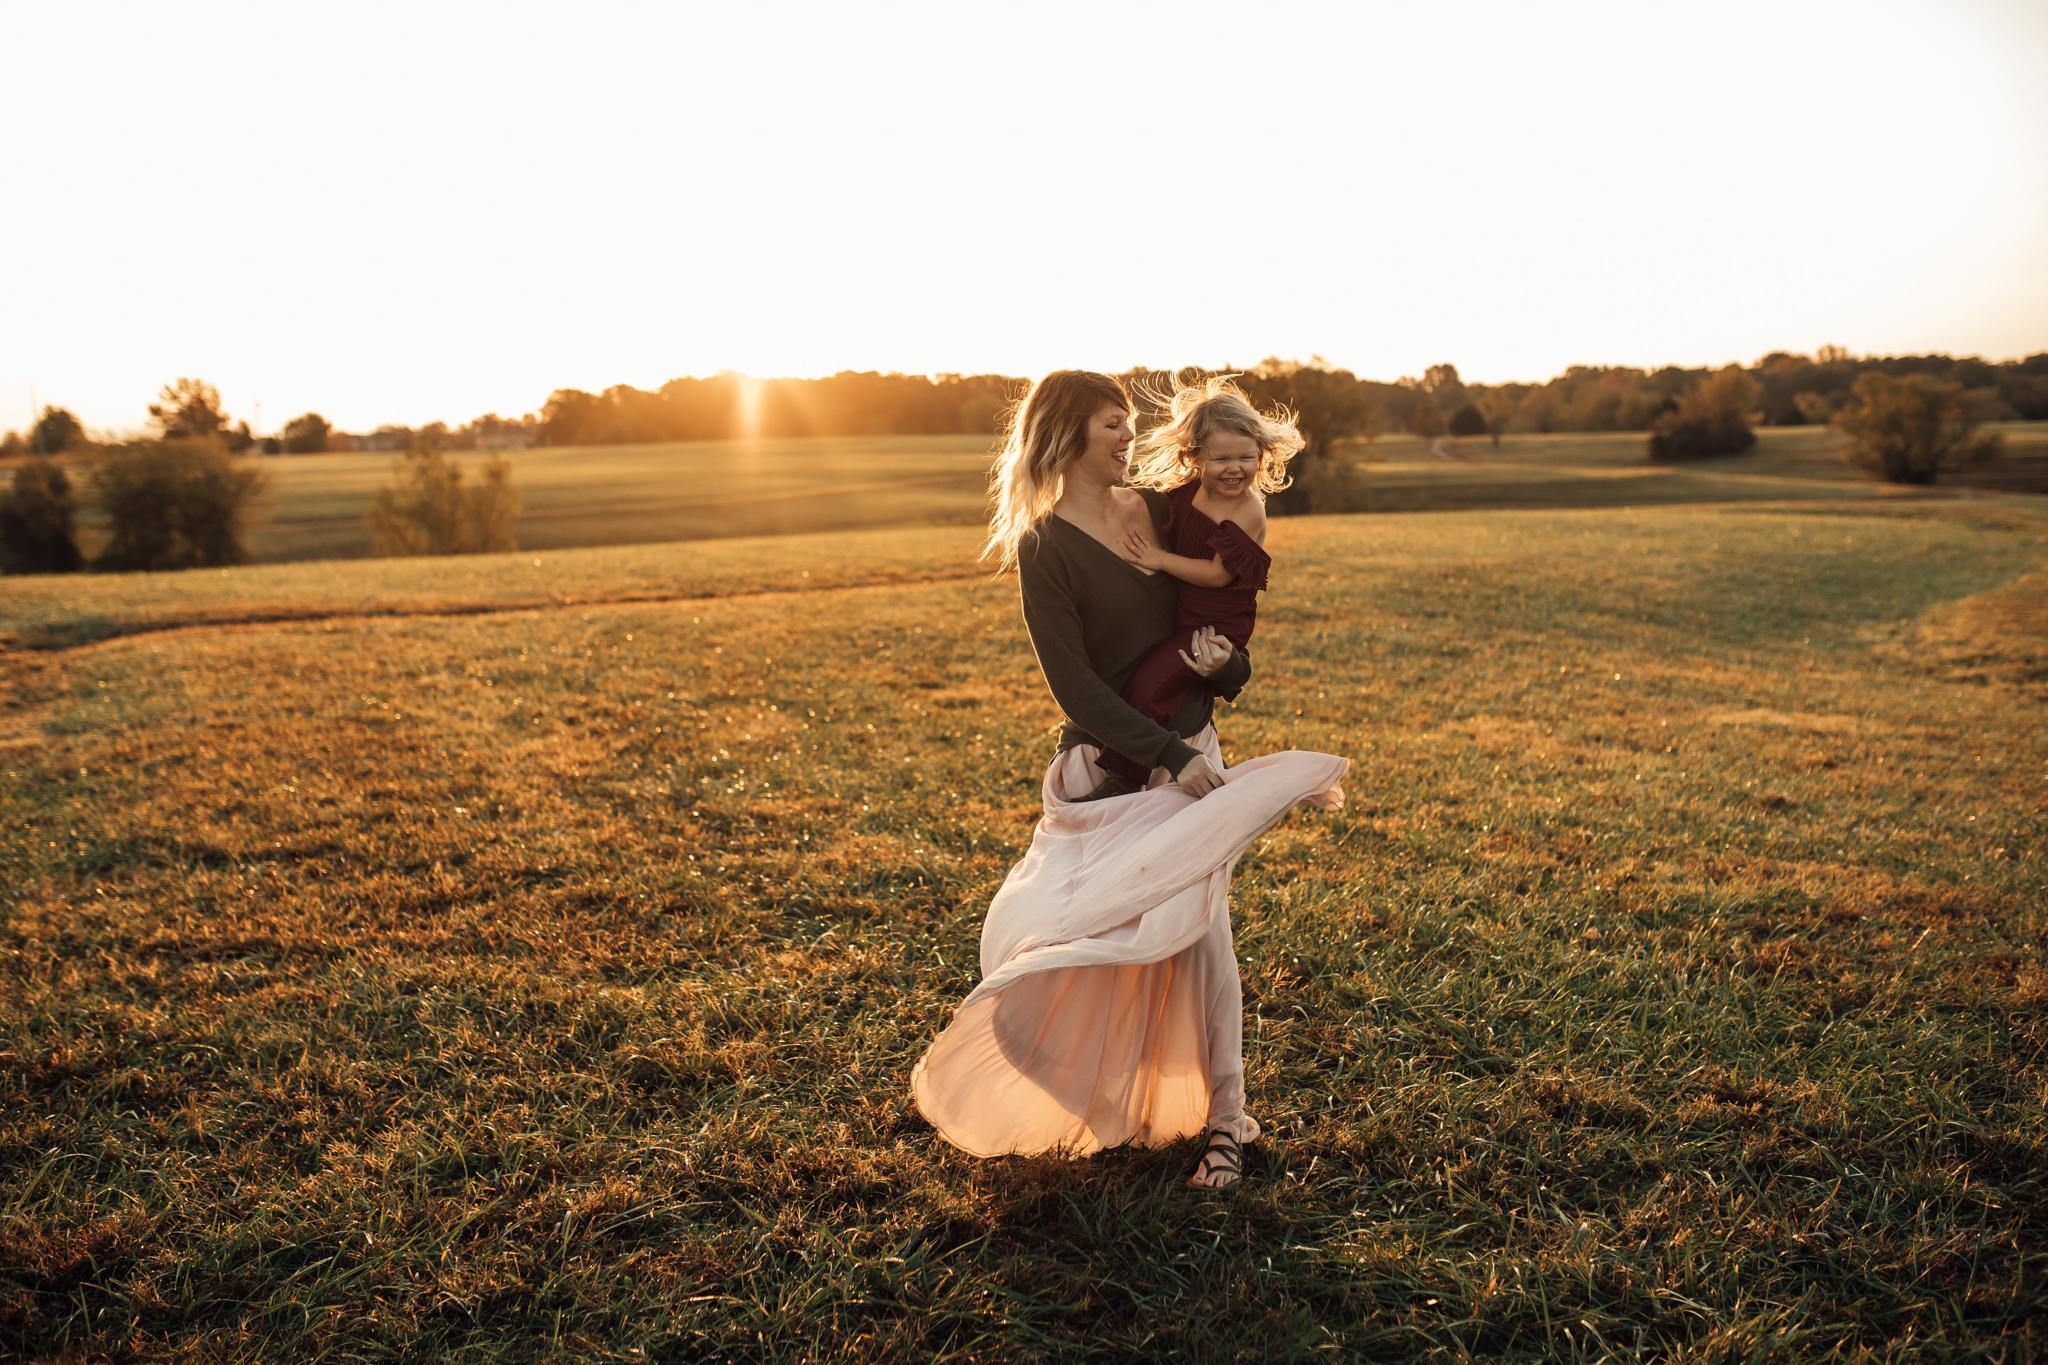 cassie-cook-photography-memphis-family-photographer-lifestyle-family-photographer-sunrise-gray-family-27.jpg